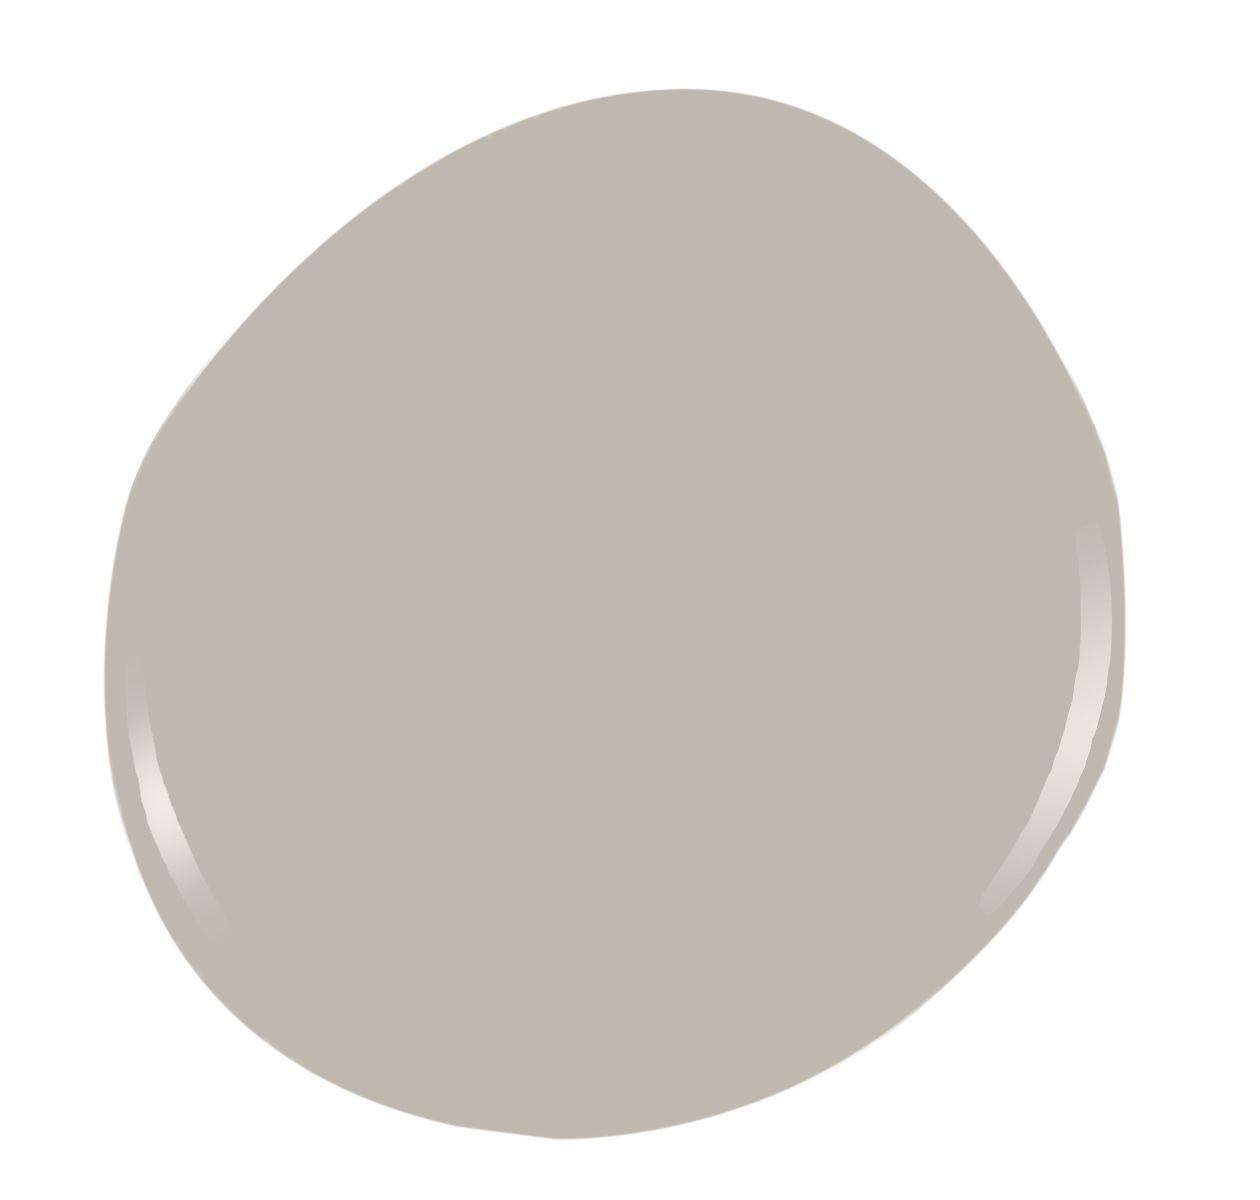 Coastal Fog By Benjamin Moore Warm Gray Paint Colour